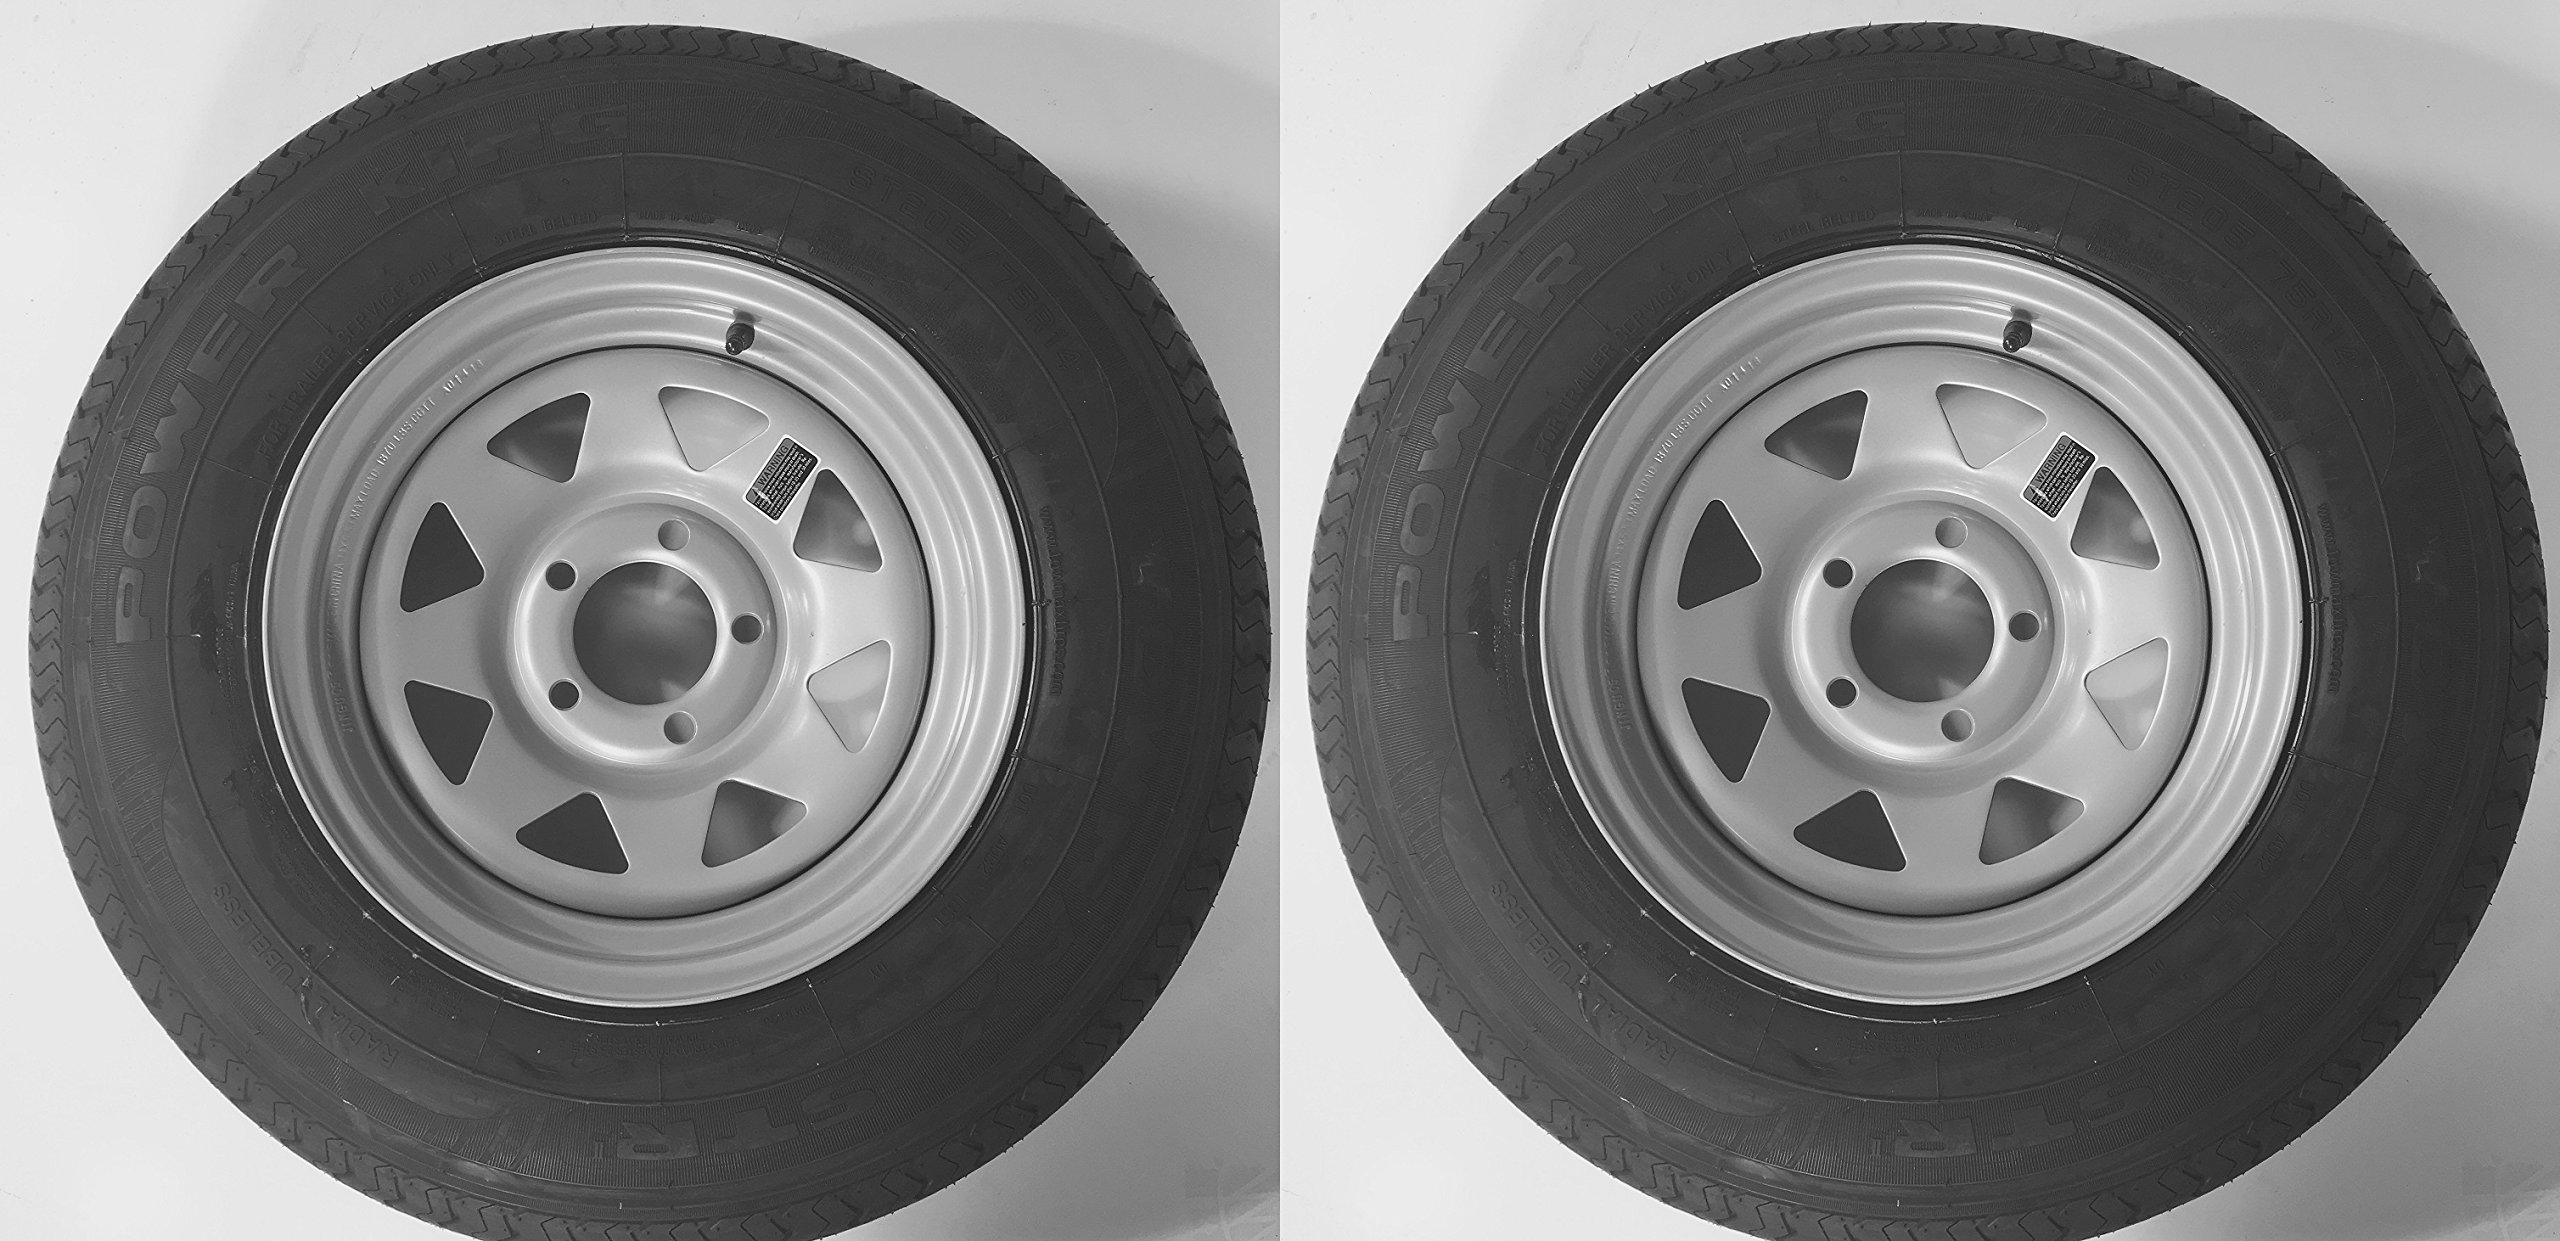 2-Pack Radial Trailer Tire w/Silver Rim ST205/75R14 LRC 5 Lug/4.5'' C Spoke Wheel